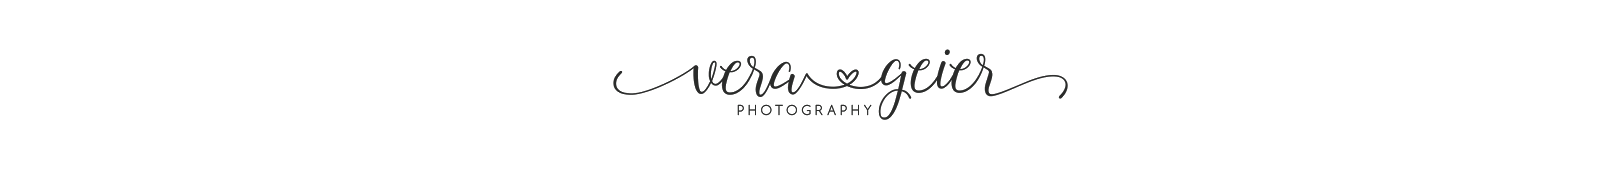 vera geier photography